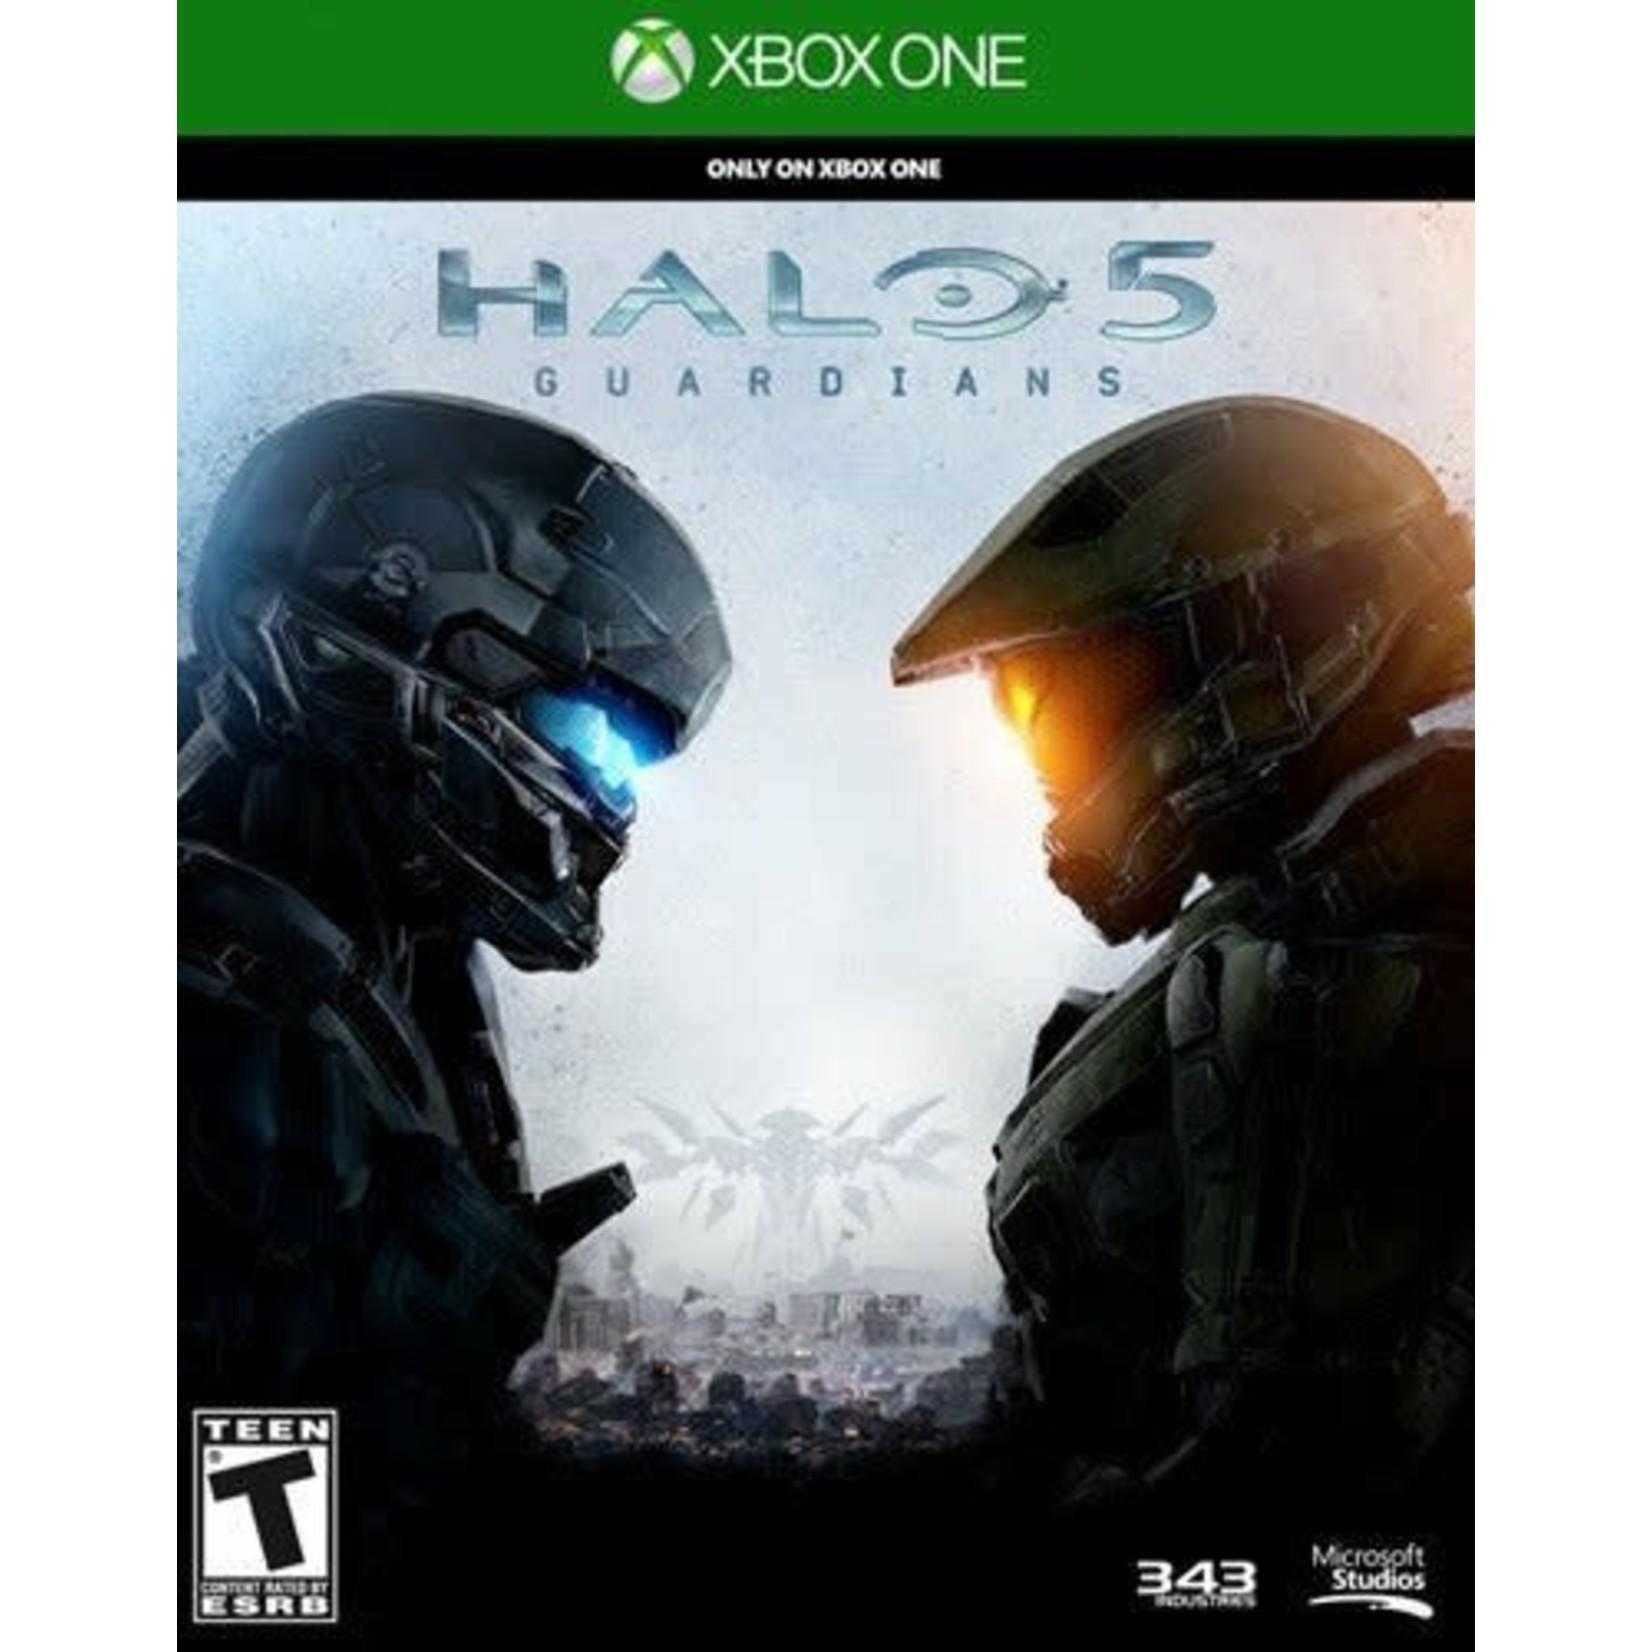 XB1U-Halo 5: Guardians